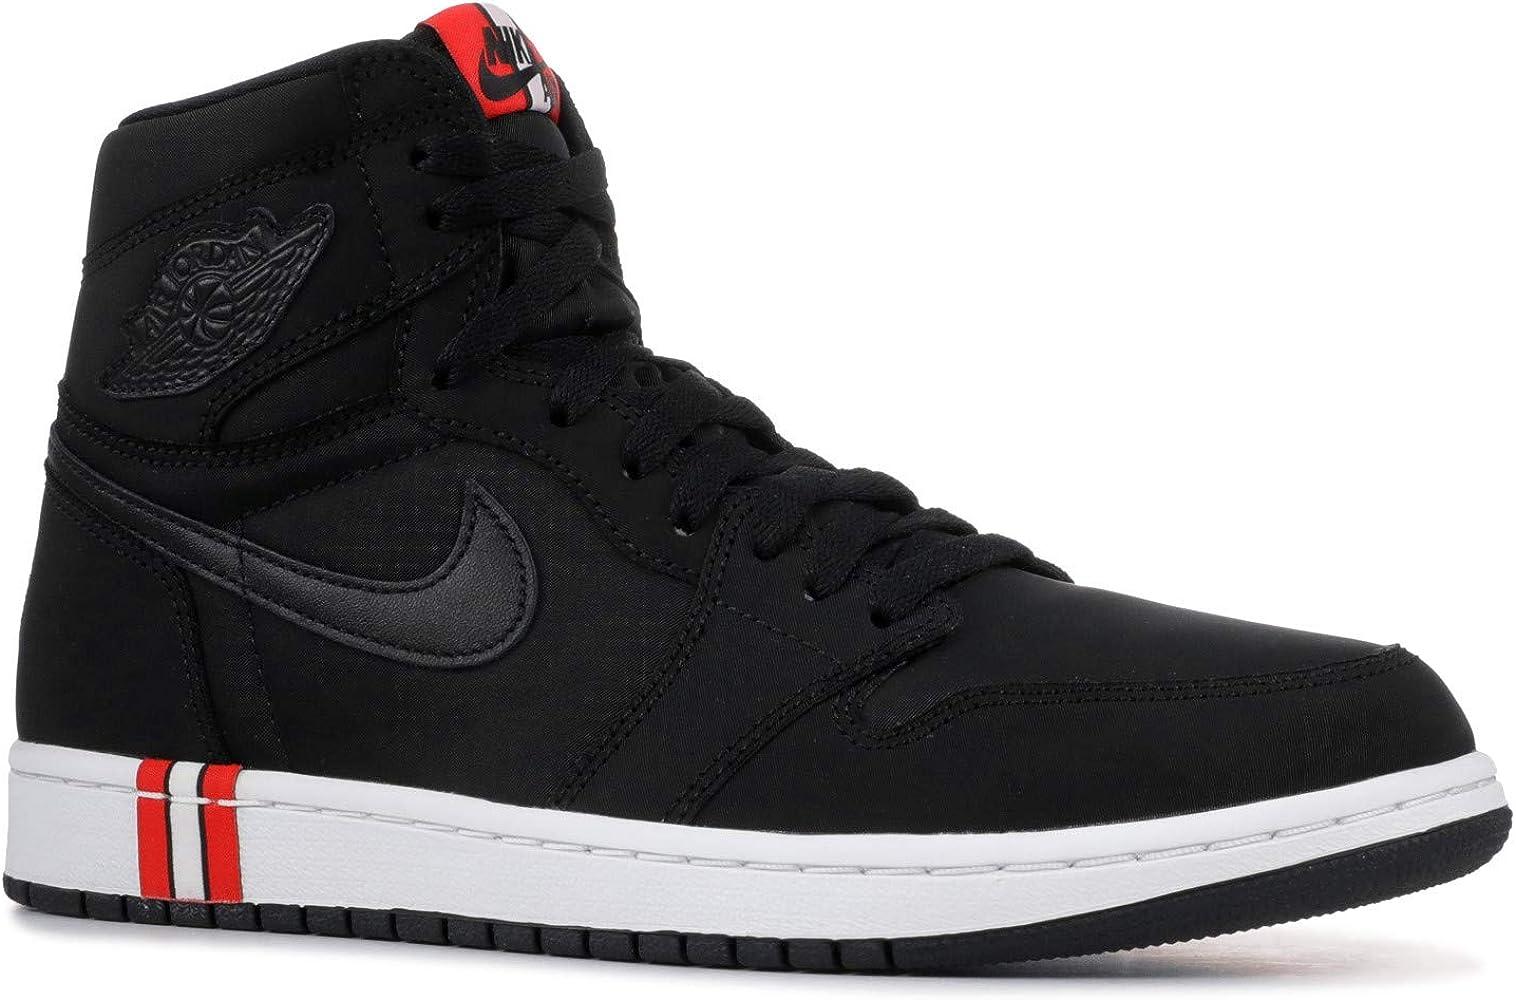 Nike Air Jordan 1 Retro HI OG BCFC Mens